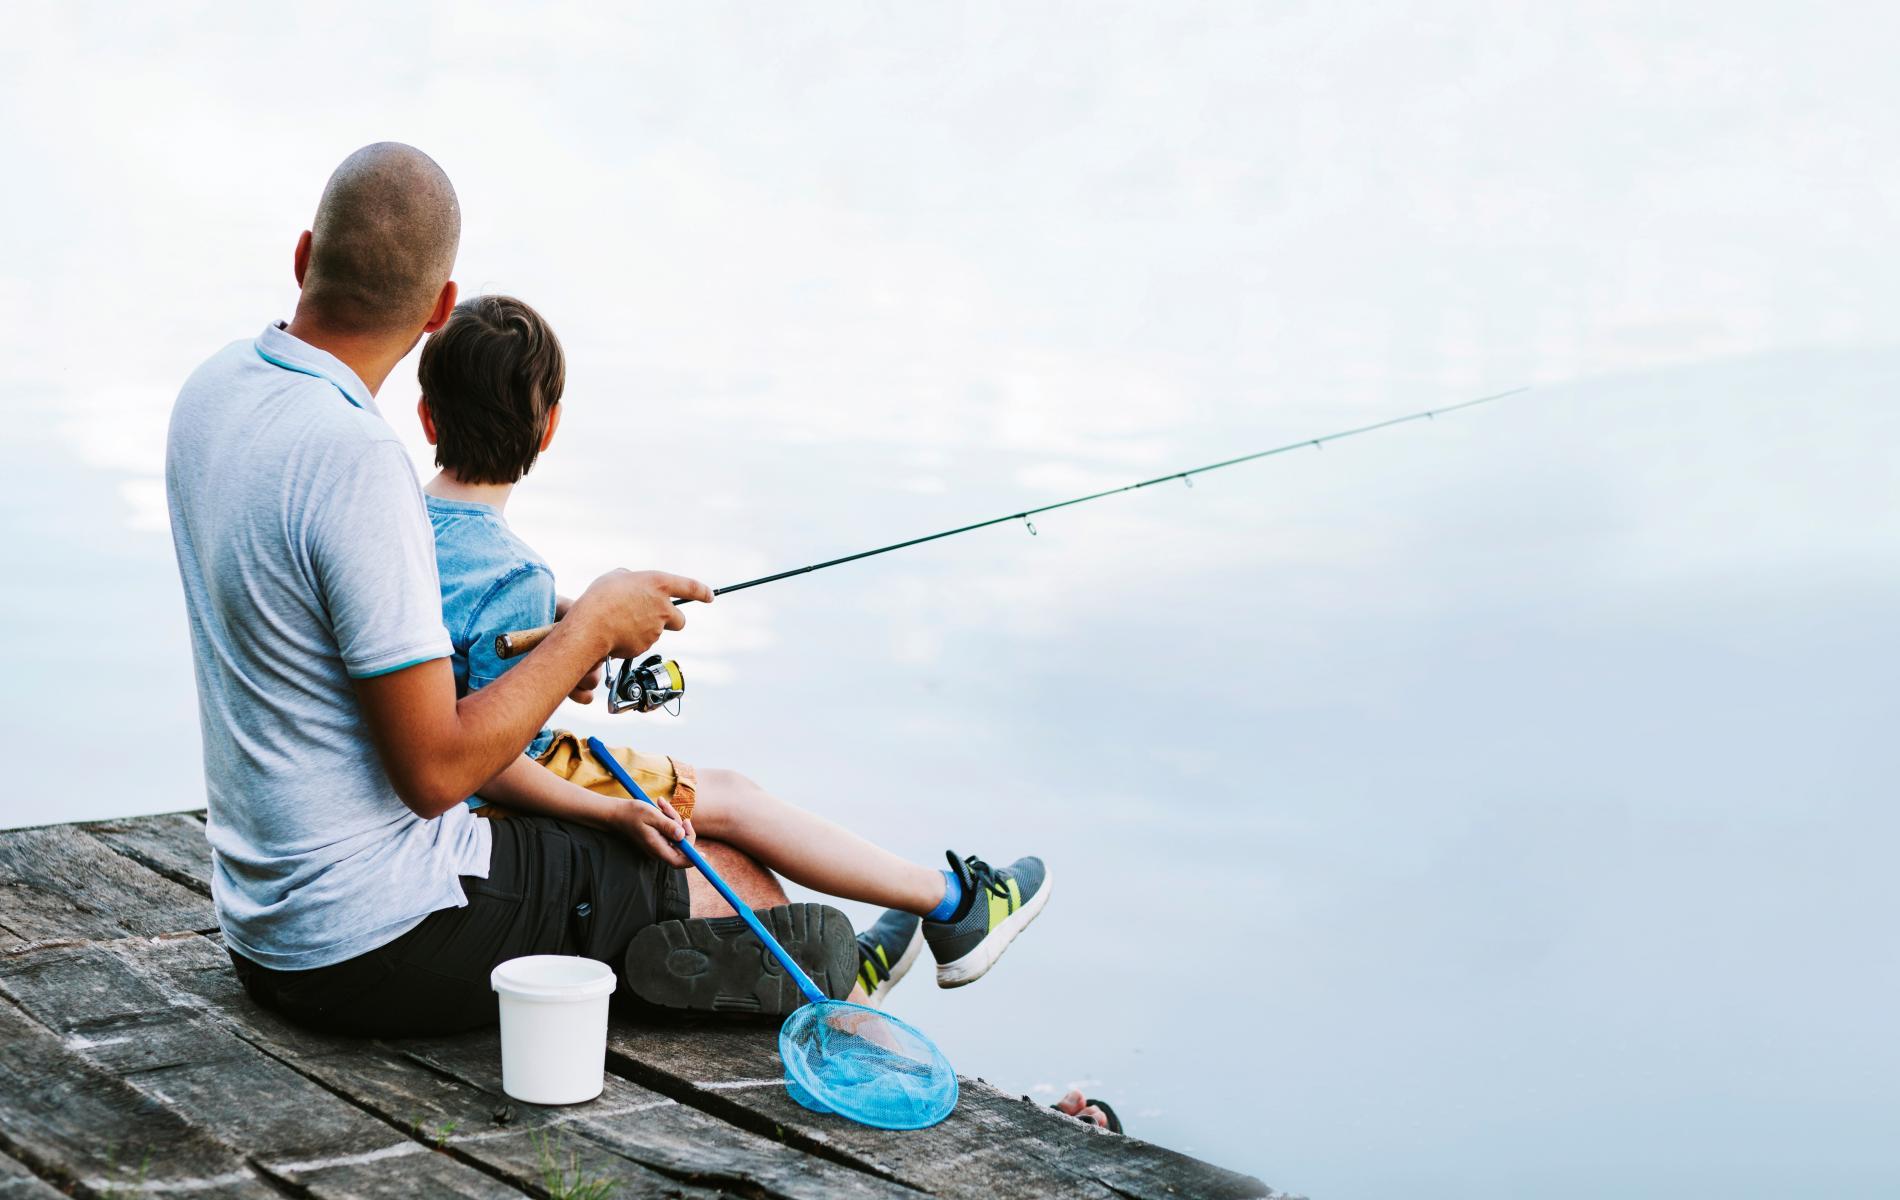 La pêche dans les rivières du Cantal